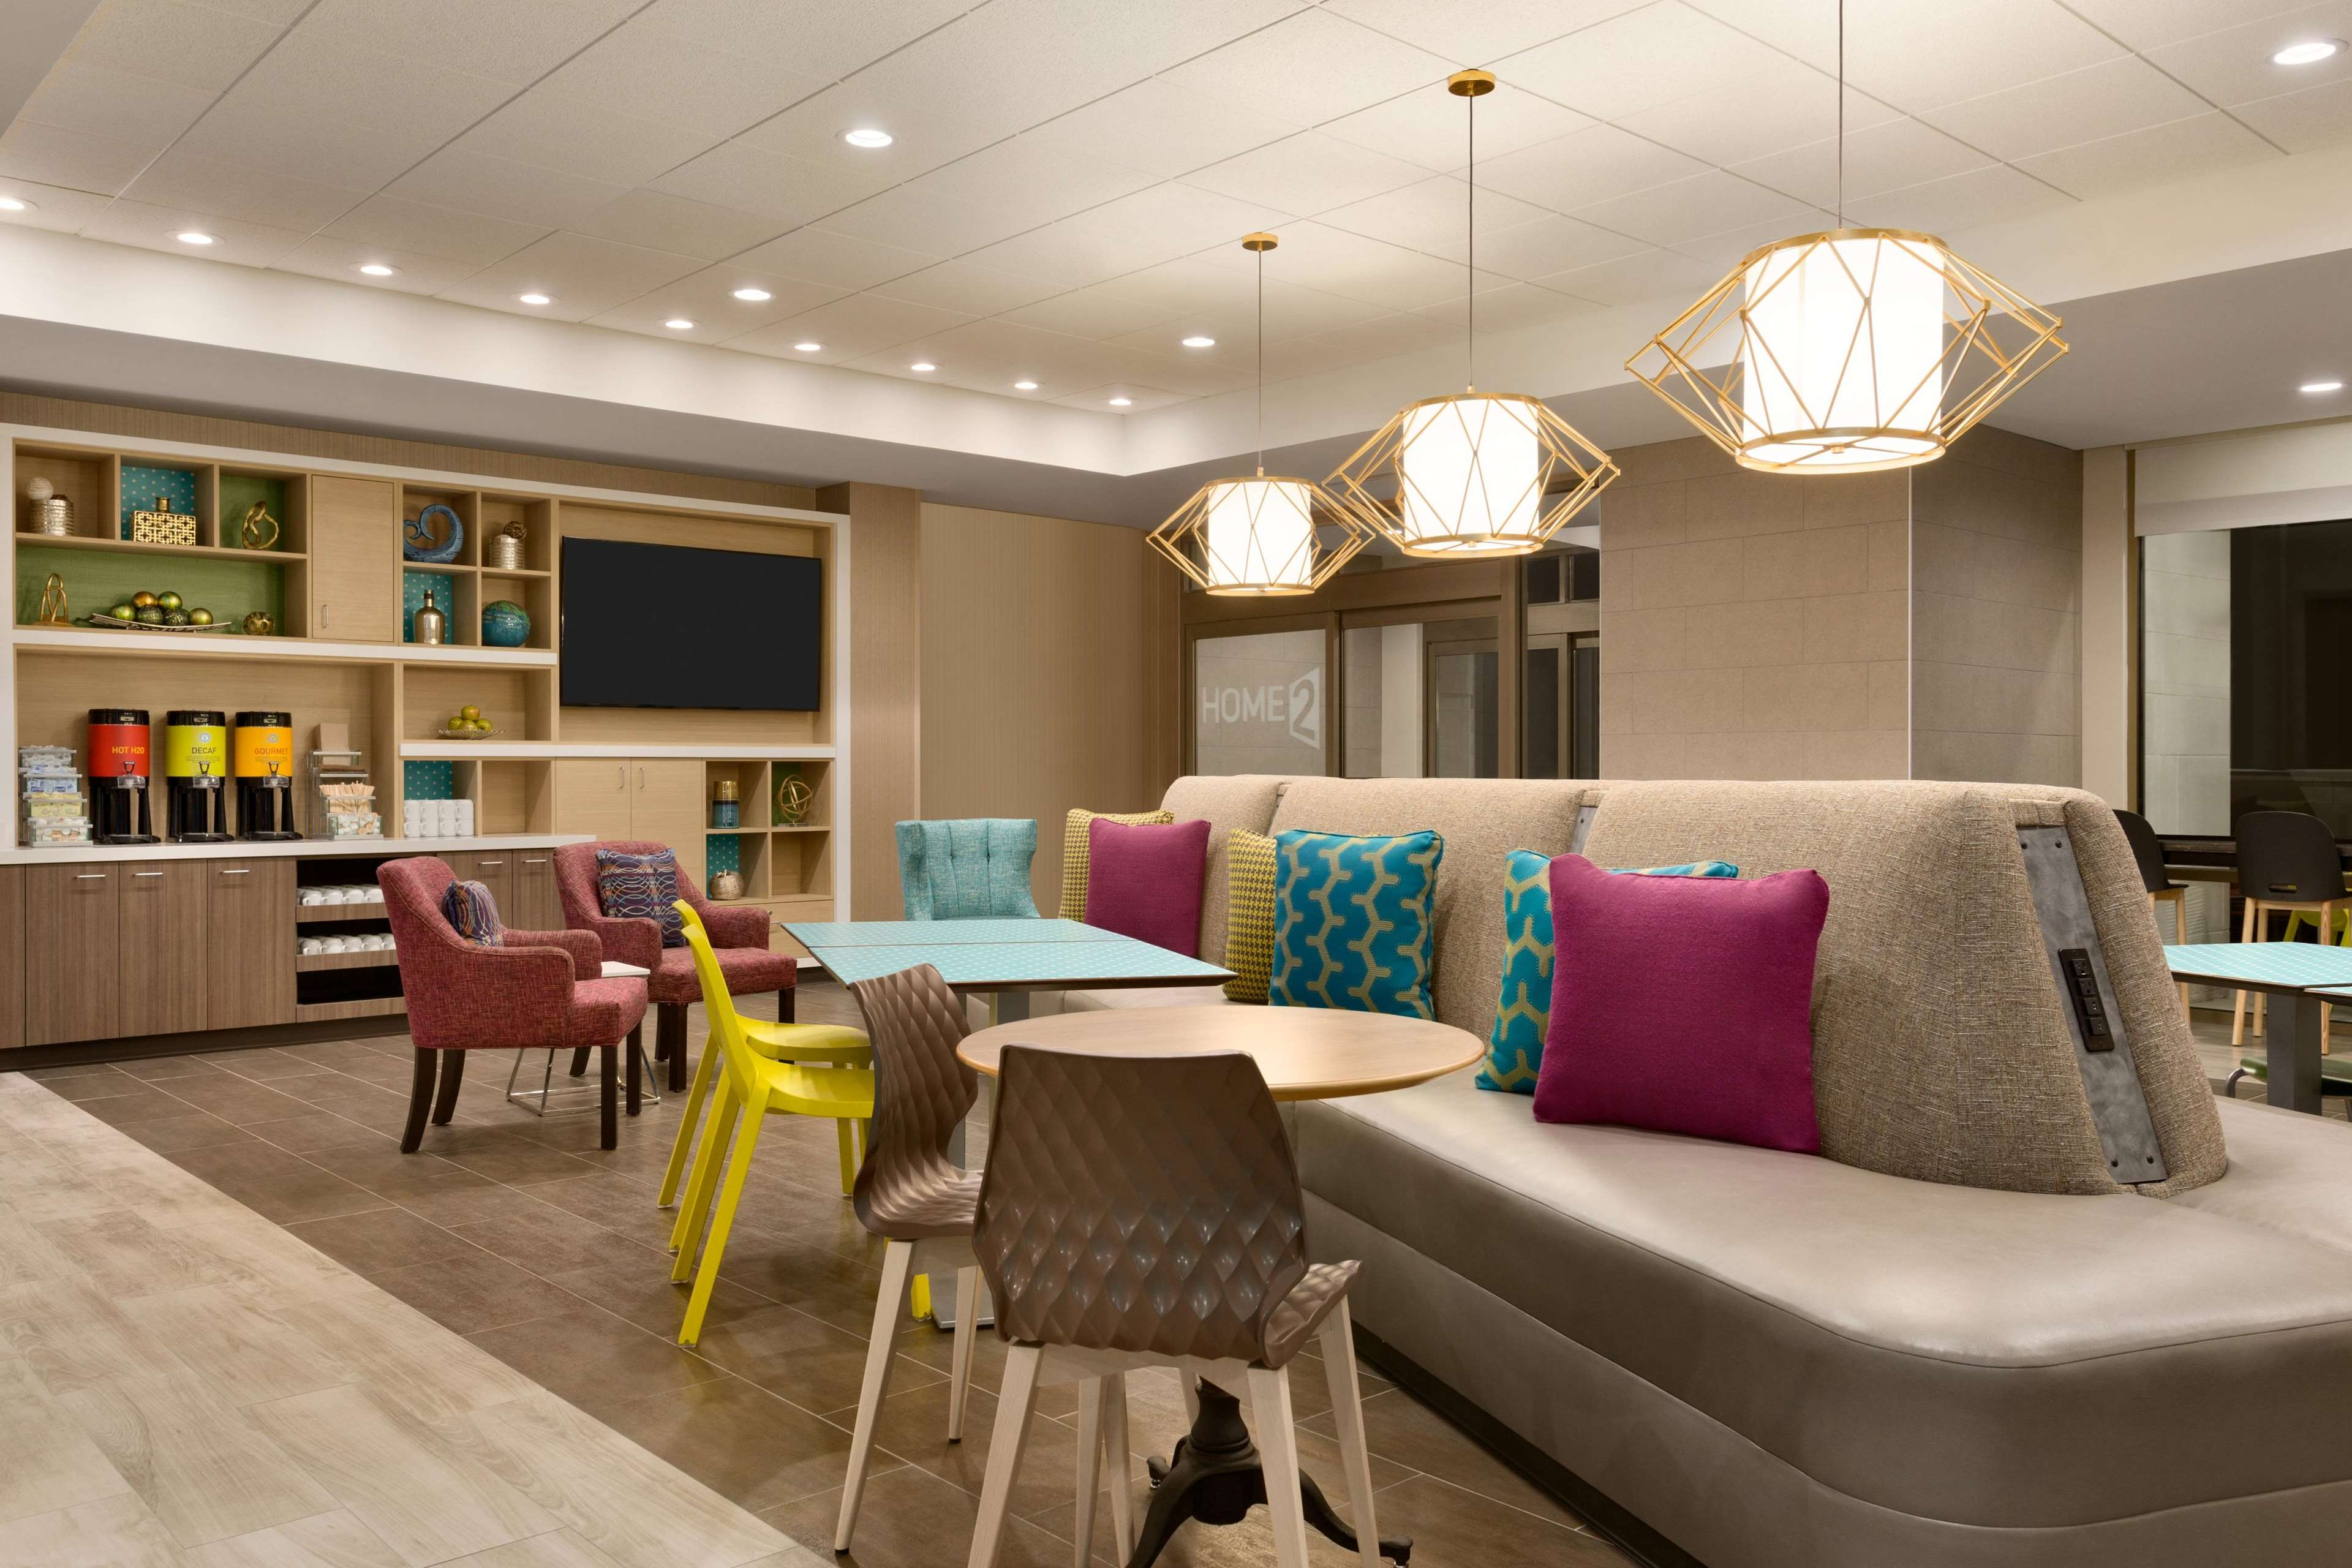 Home2 Suites by Hilton Florence Cincinnati Airport South image 5